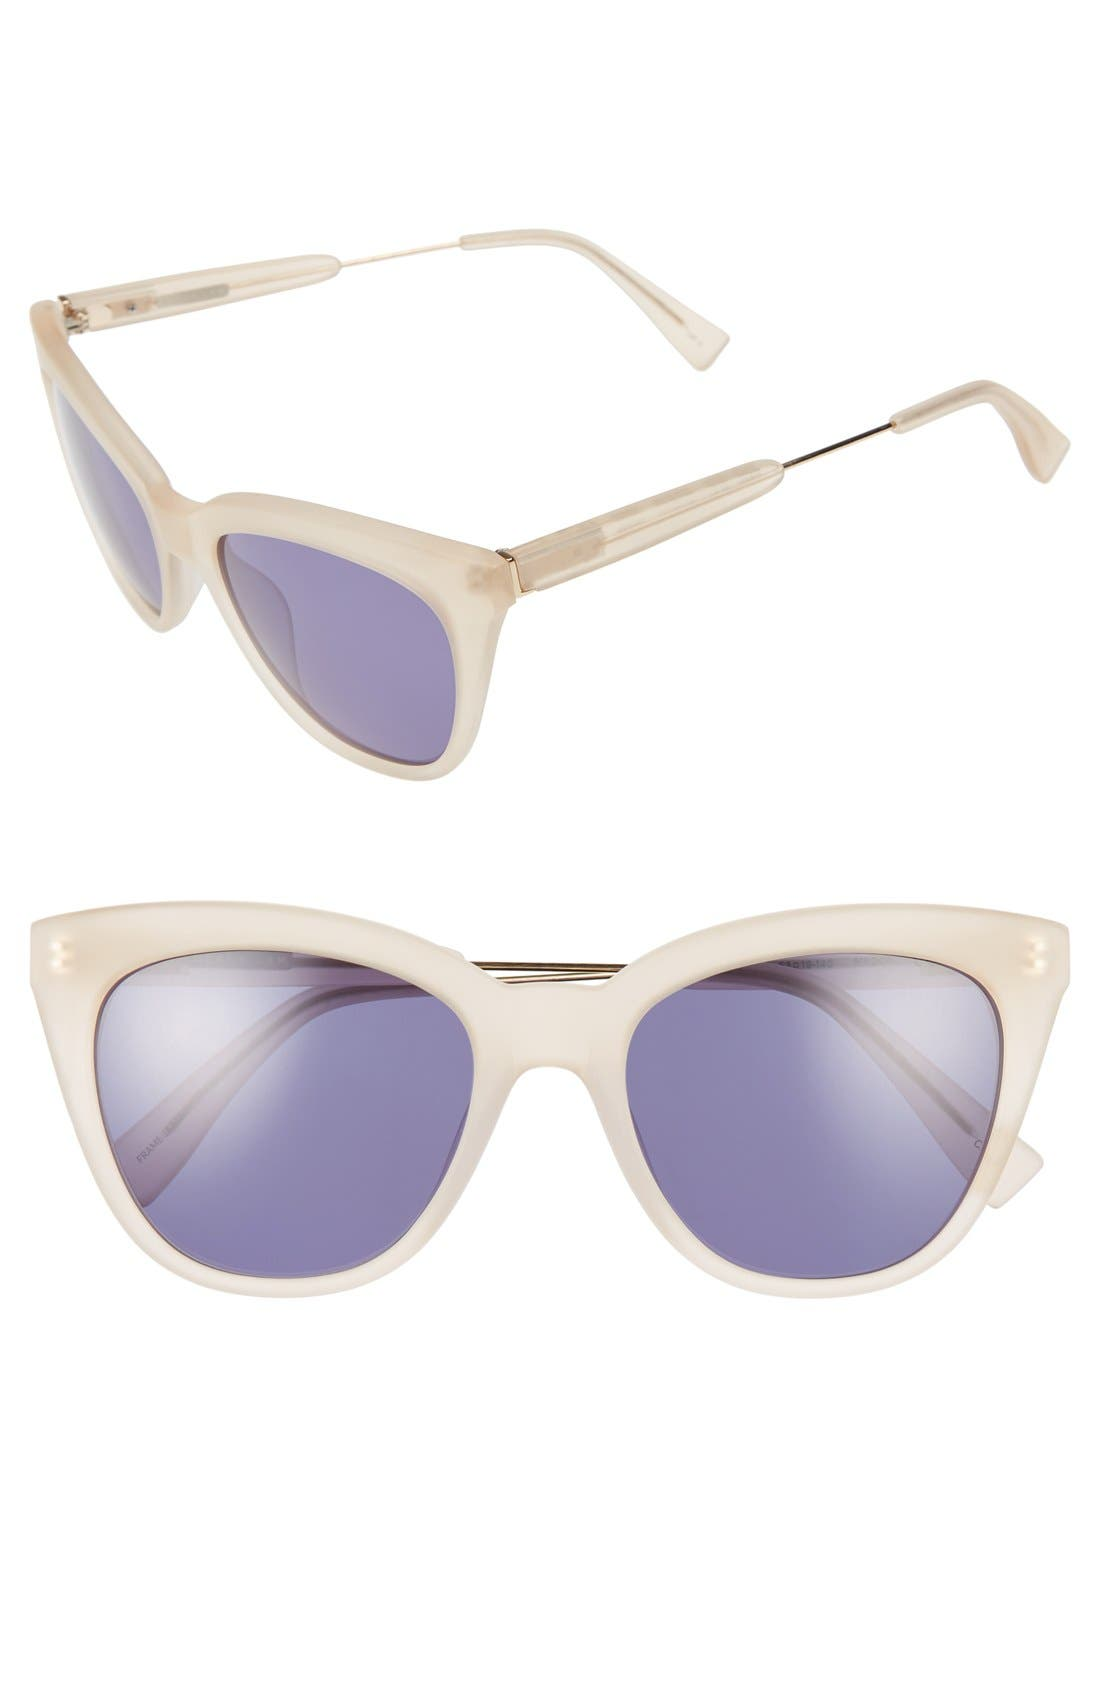 Derek Lam 'Lenox' 53mm Cat Eye Sunglasses